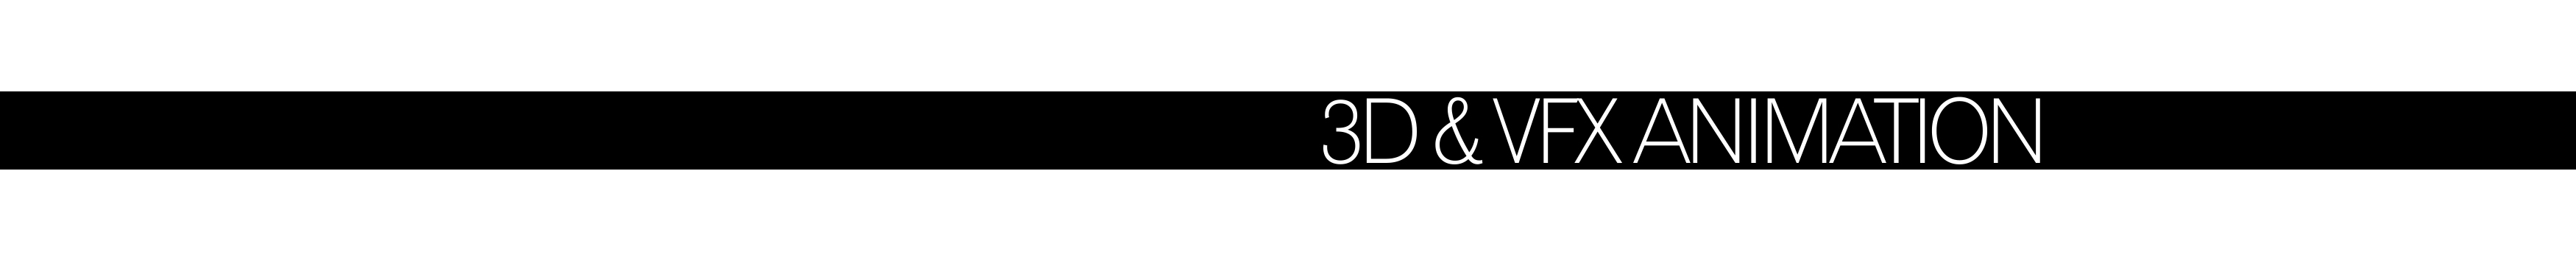 Animación 3D & Visual effects